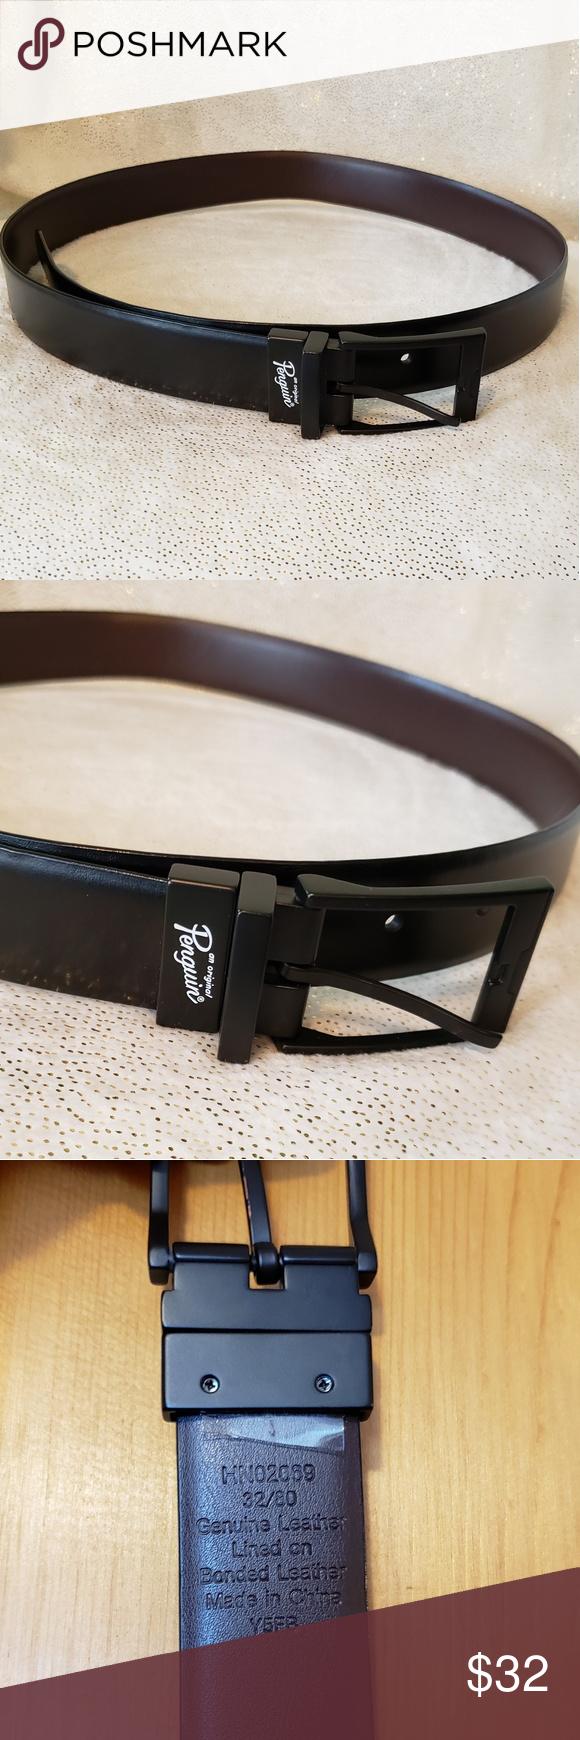 Penguin Leather Belt Penguin Leather Belt Original